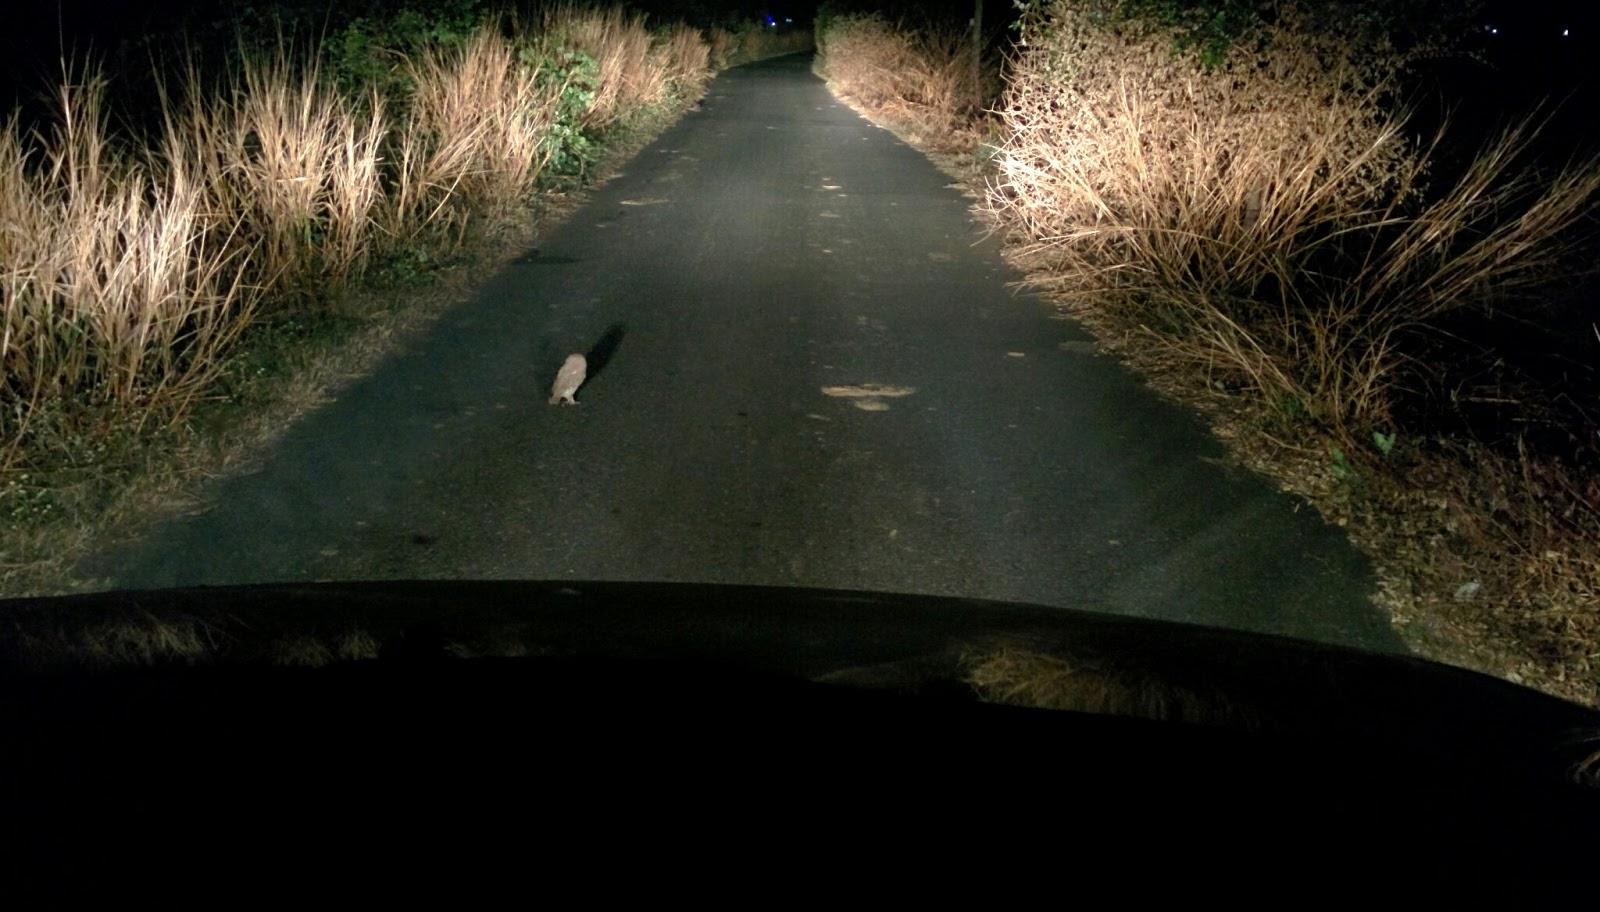 Crazy owl blocking my path.